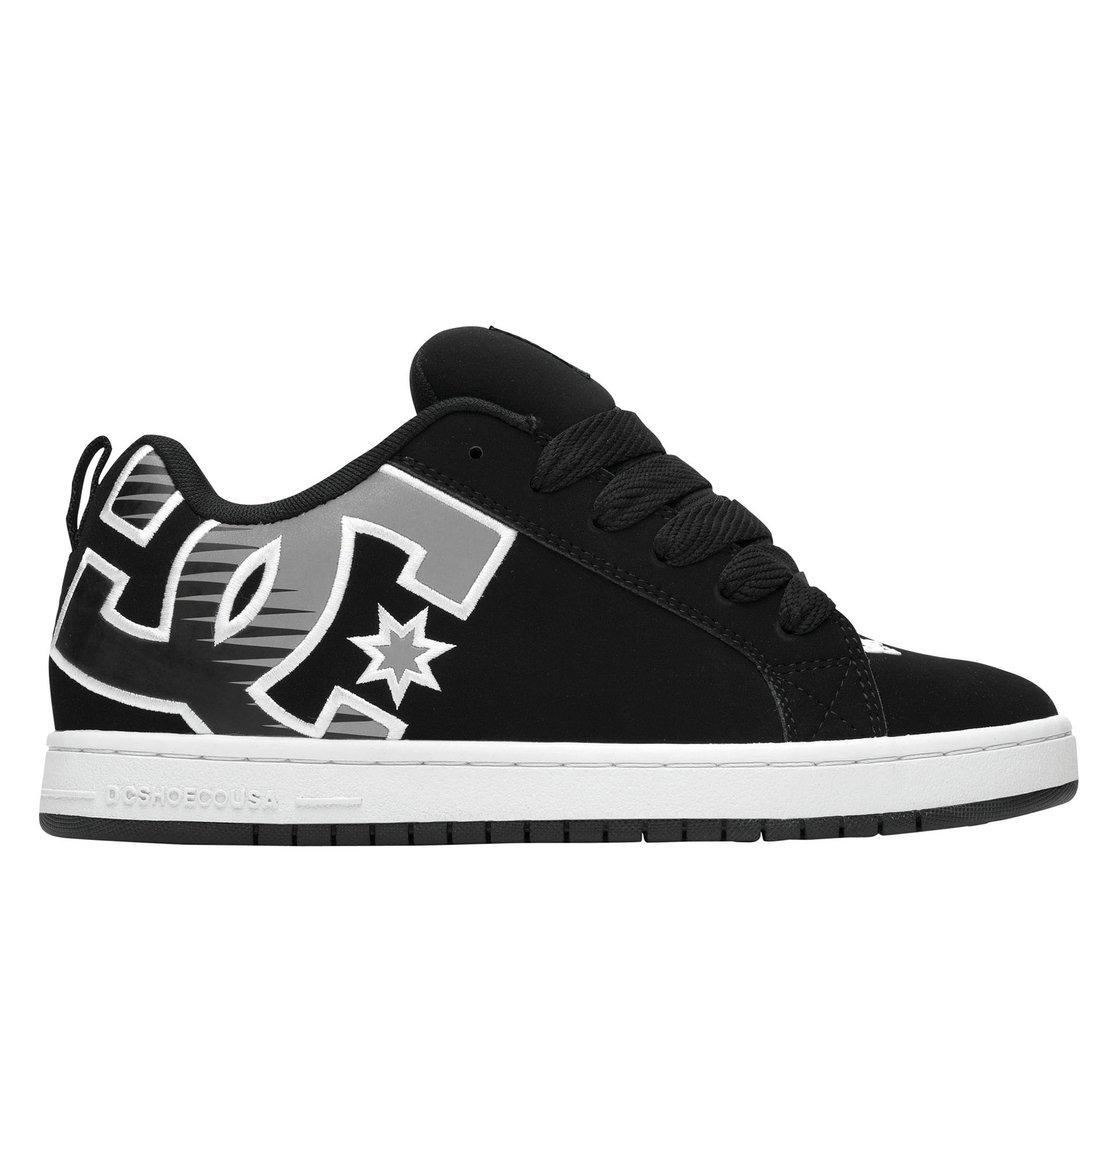 Court Graffik SE Skateboarding Shoe